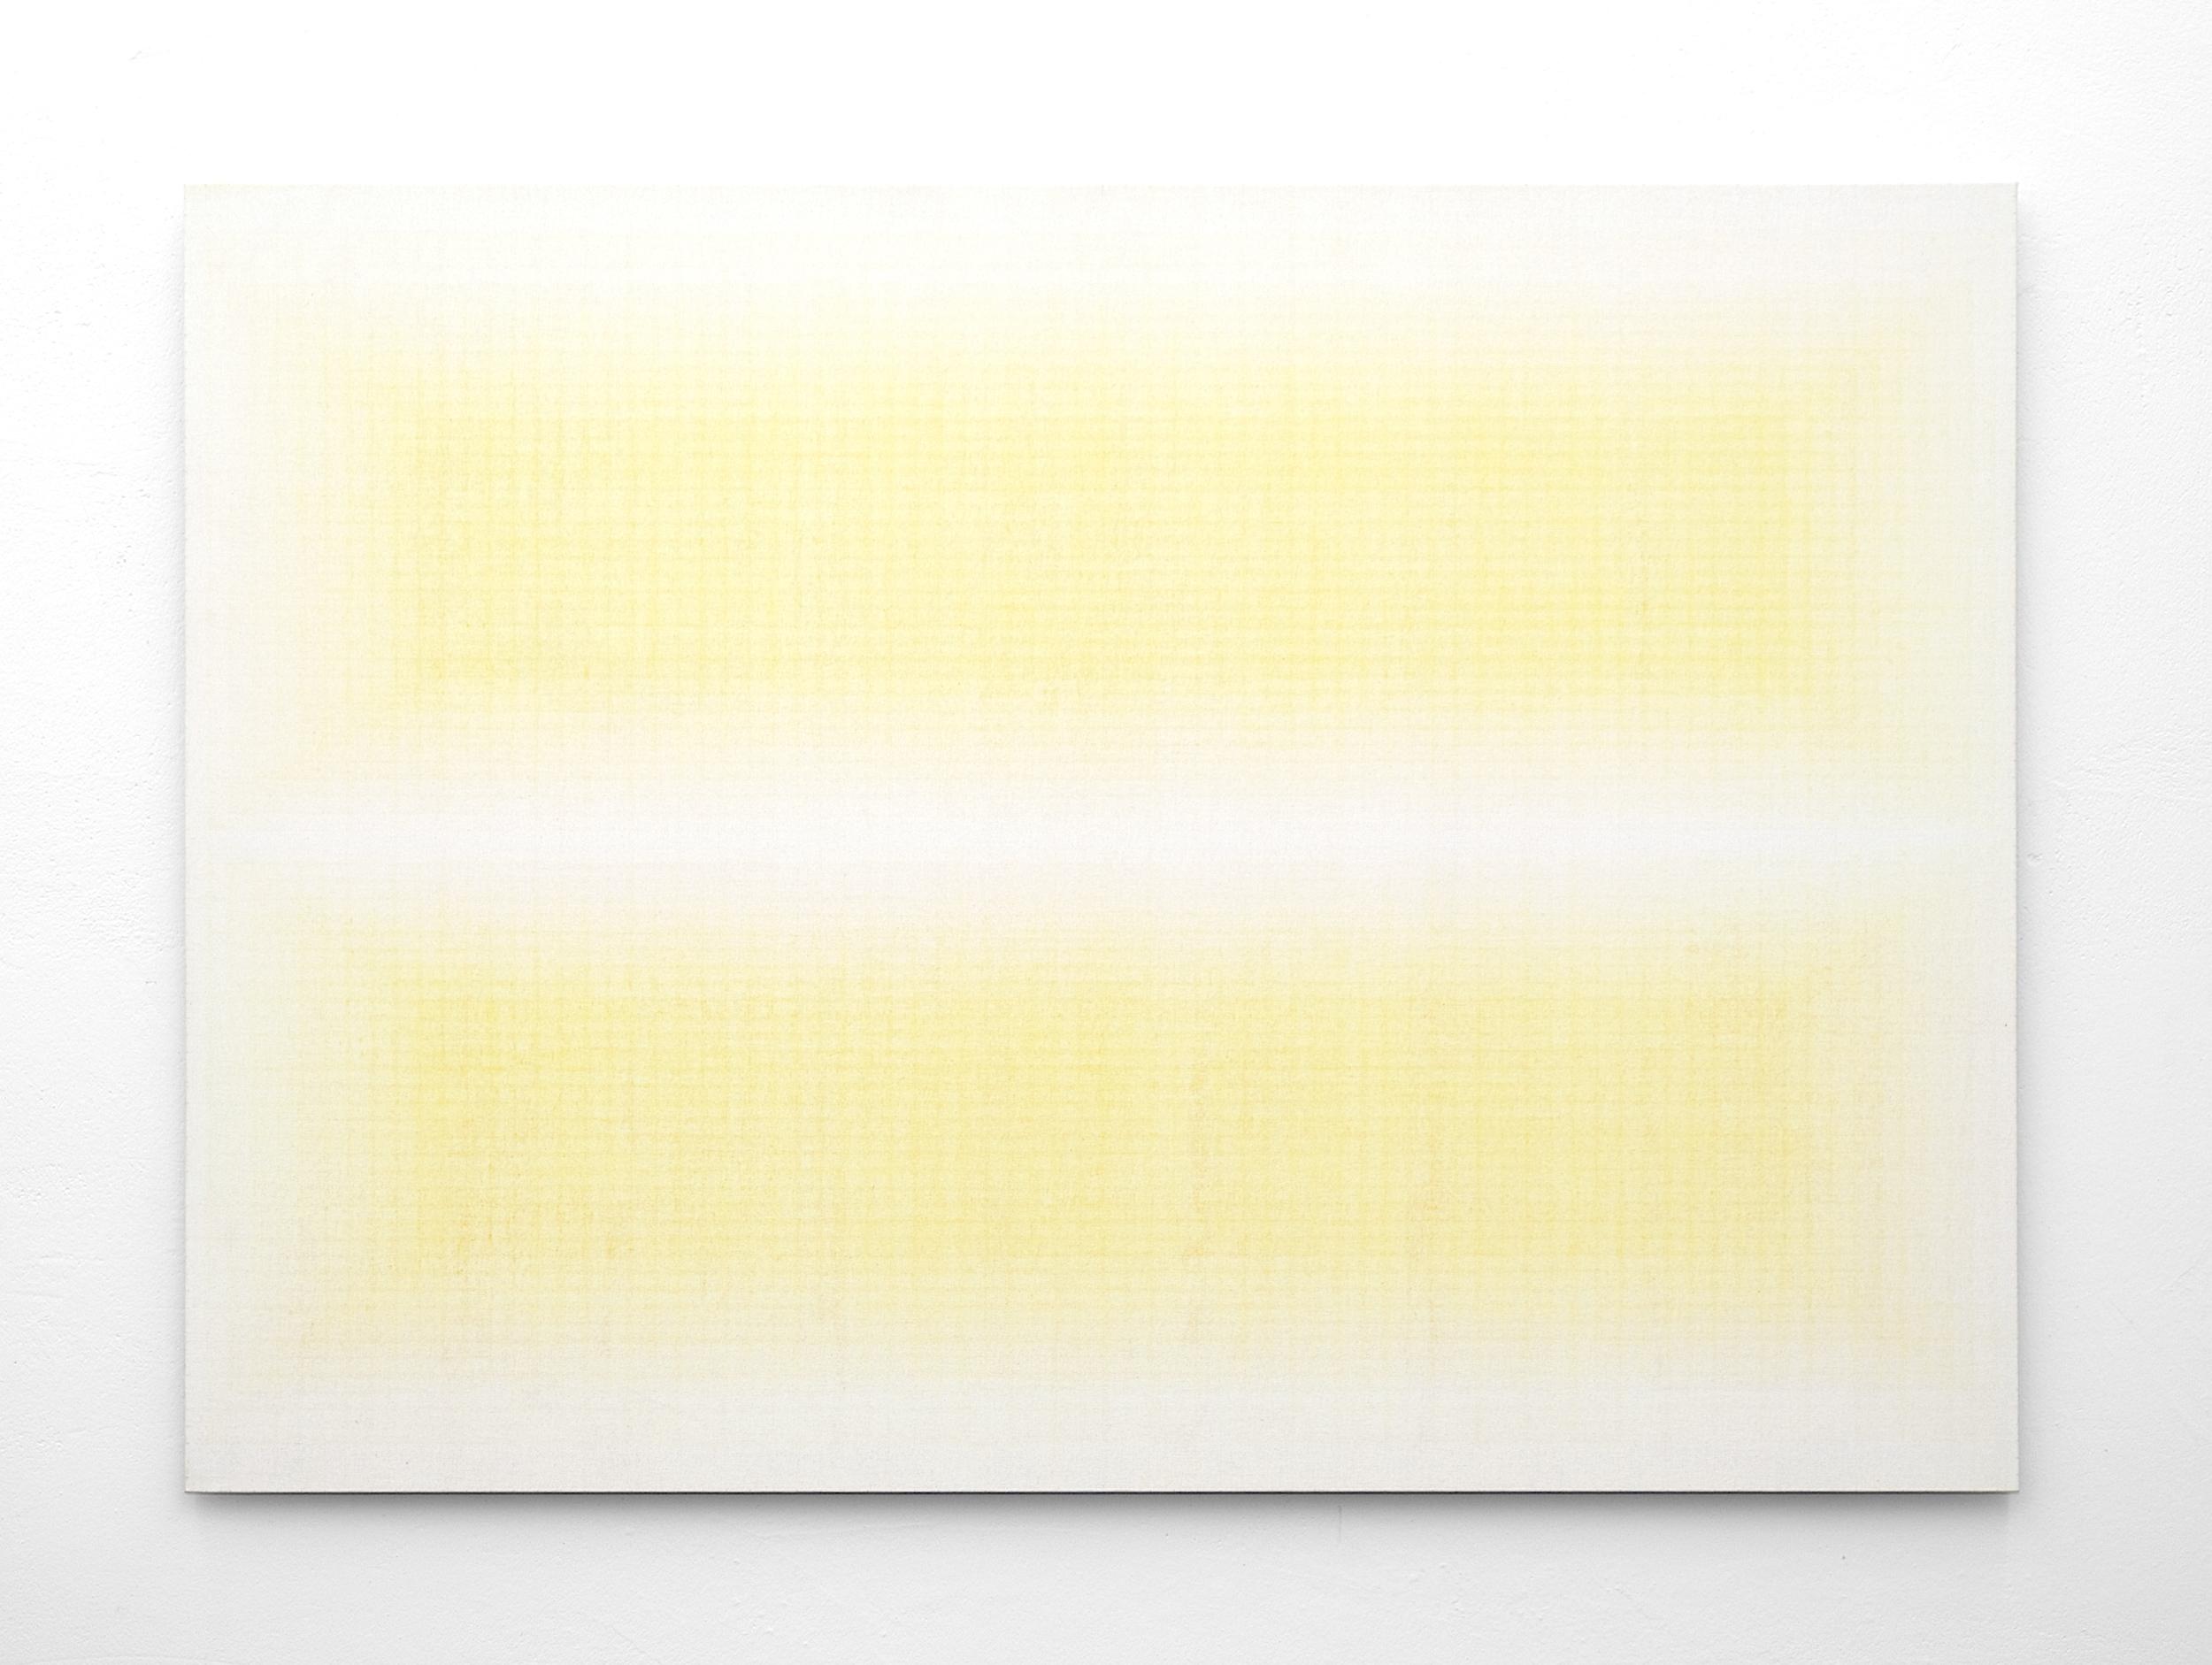 bild nr. 05/2009-100 x 140cm - acryl auf baumwolle/alu